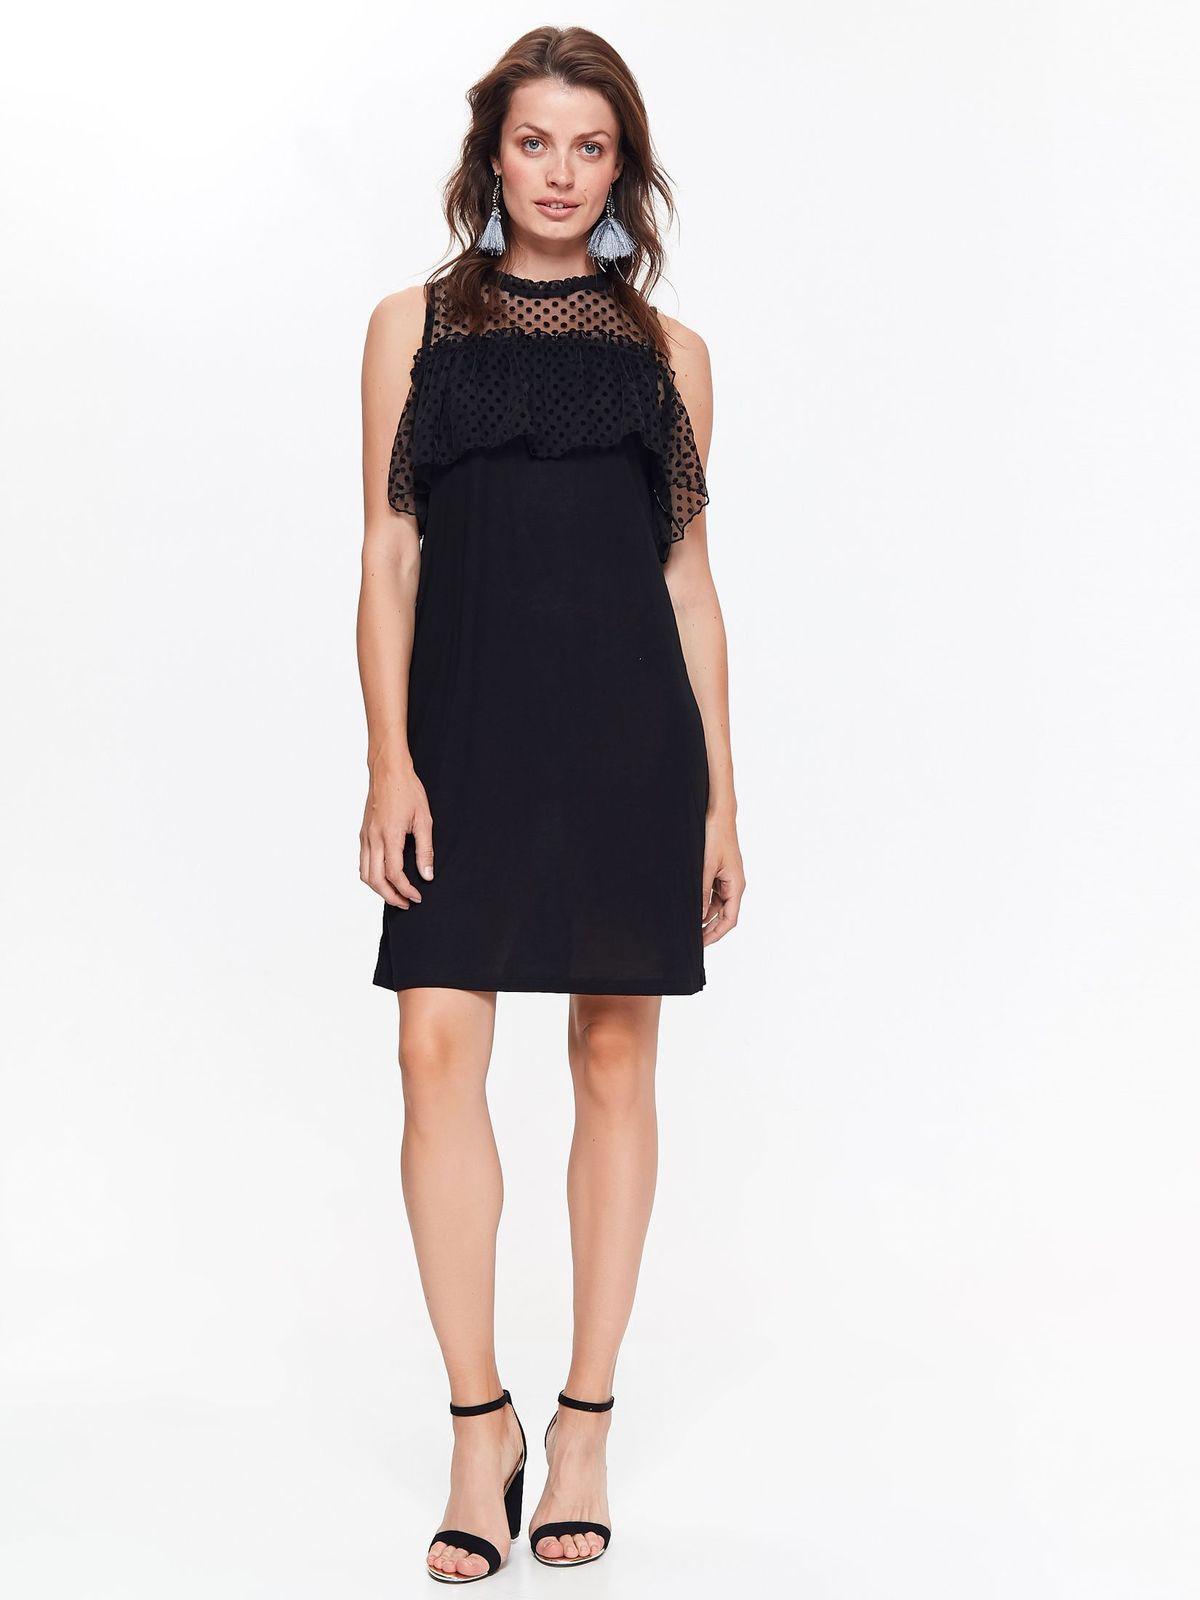 f2557f8da971 Μαύρα Γυναικεία Φορέματα Online - Σελίδα 105